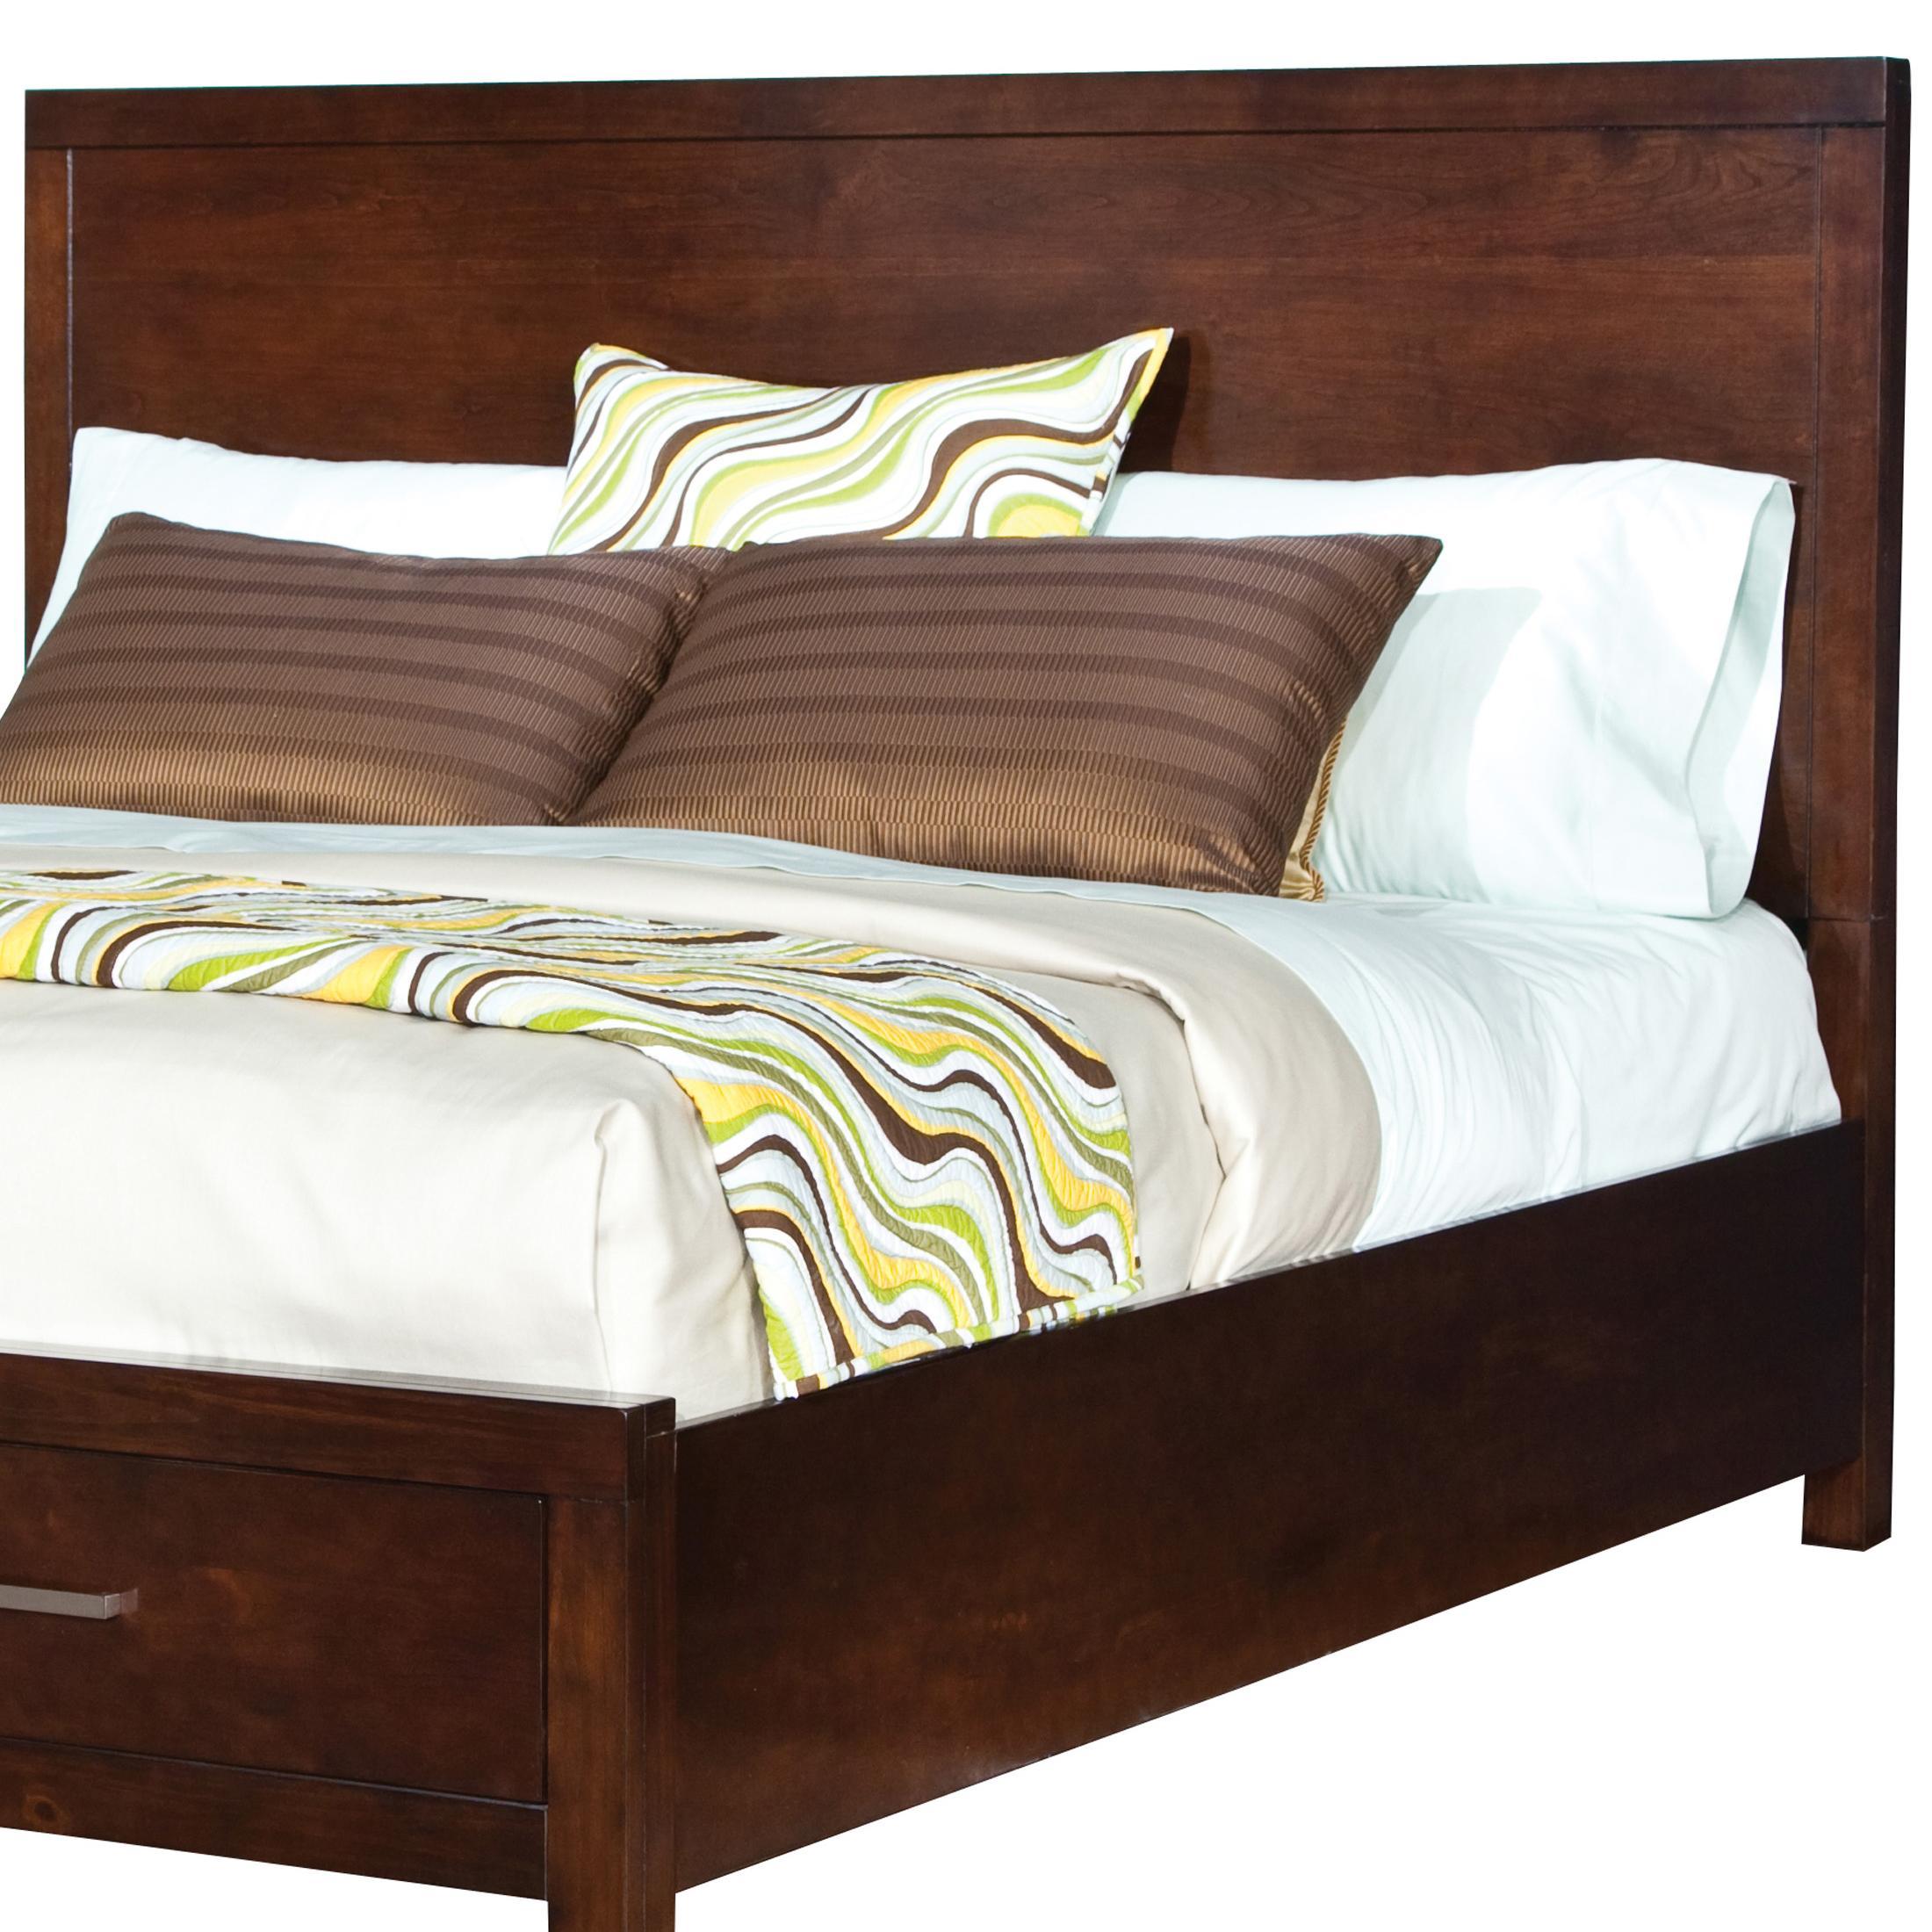 Standard Furniture Metro King Panel Headboard - Item Number: 87961